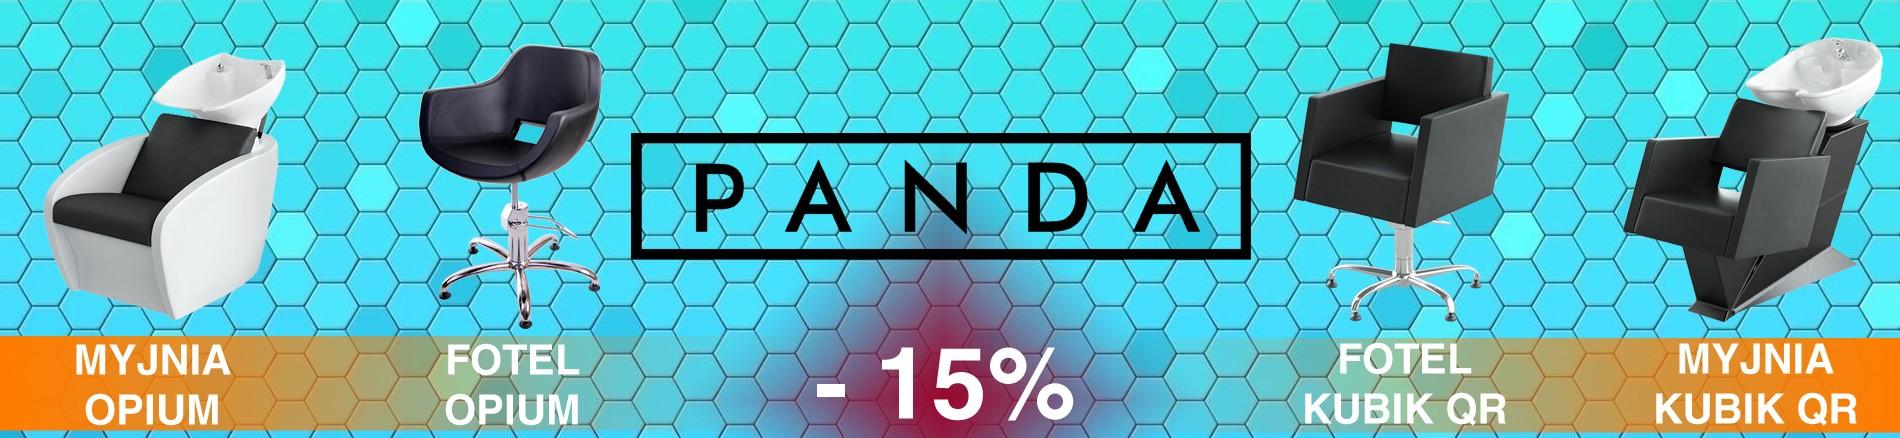 Panda Promocja Kubik QR & Opium